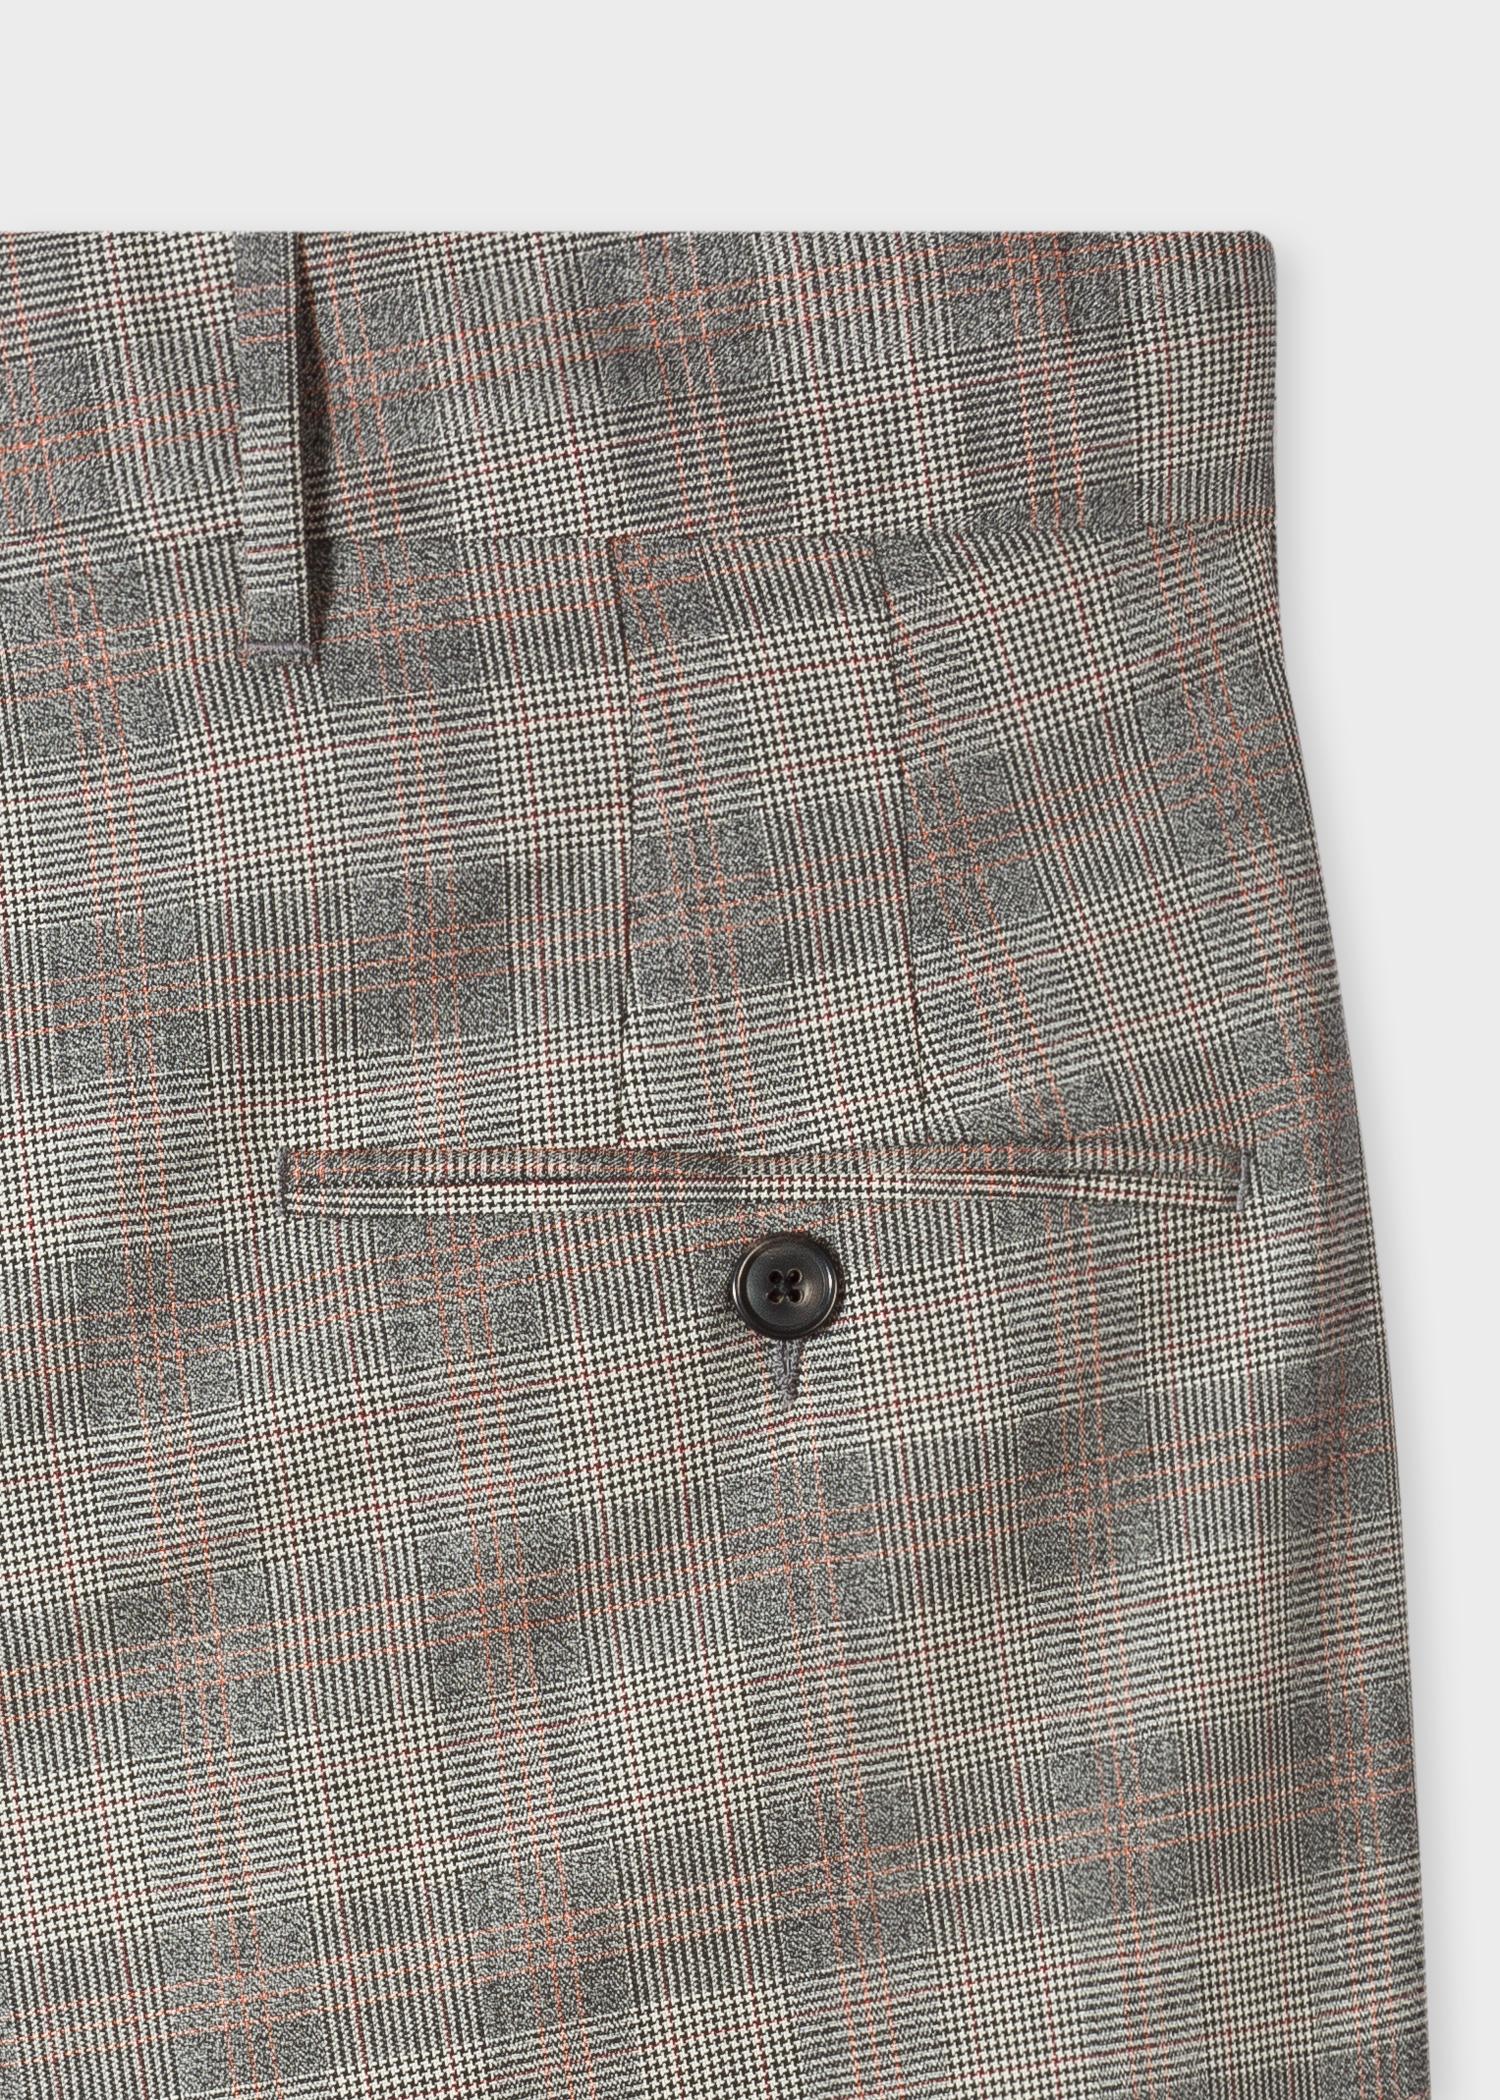 268e933f58 Rear pocket detail - Men's Wide-Leg Grey And Orange Glen Plaid Pleated Wool  Trousers